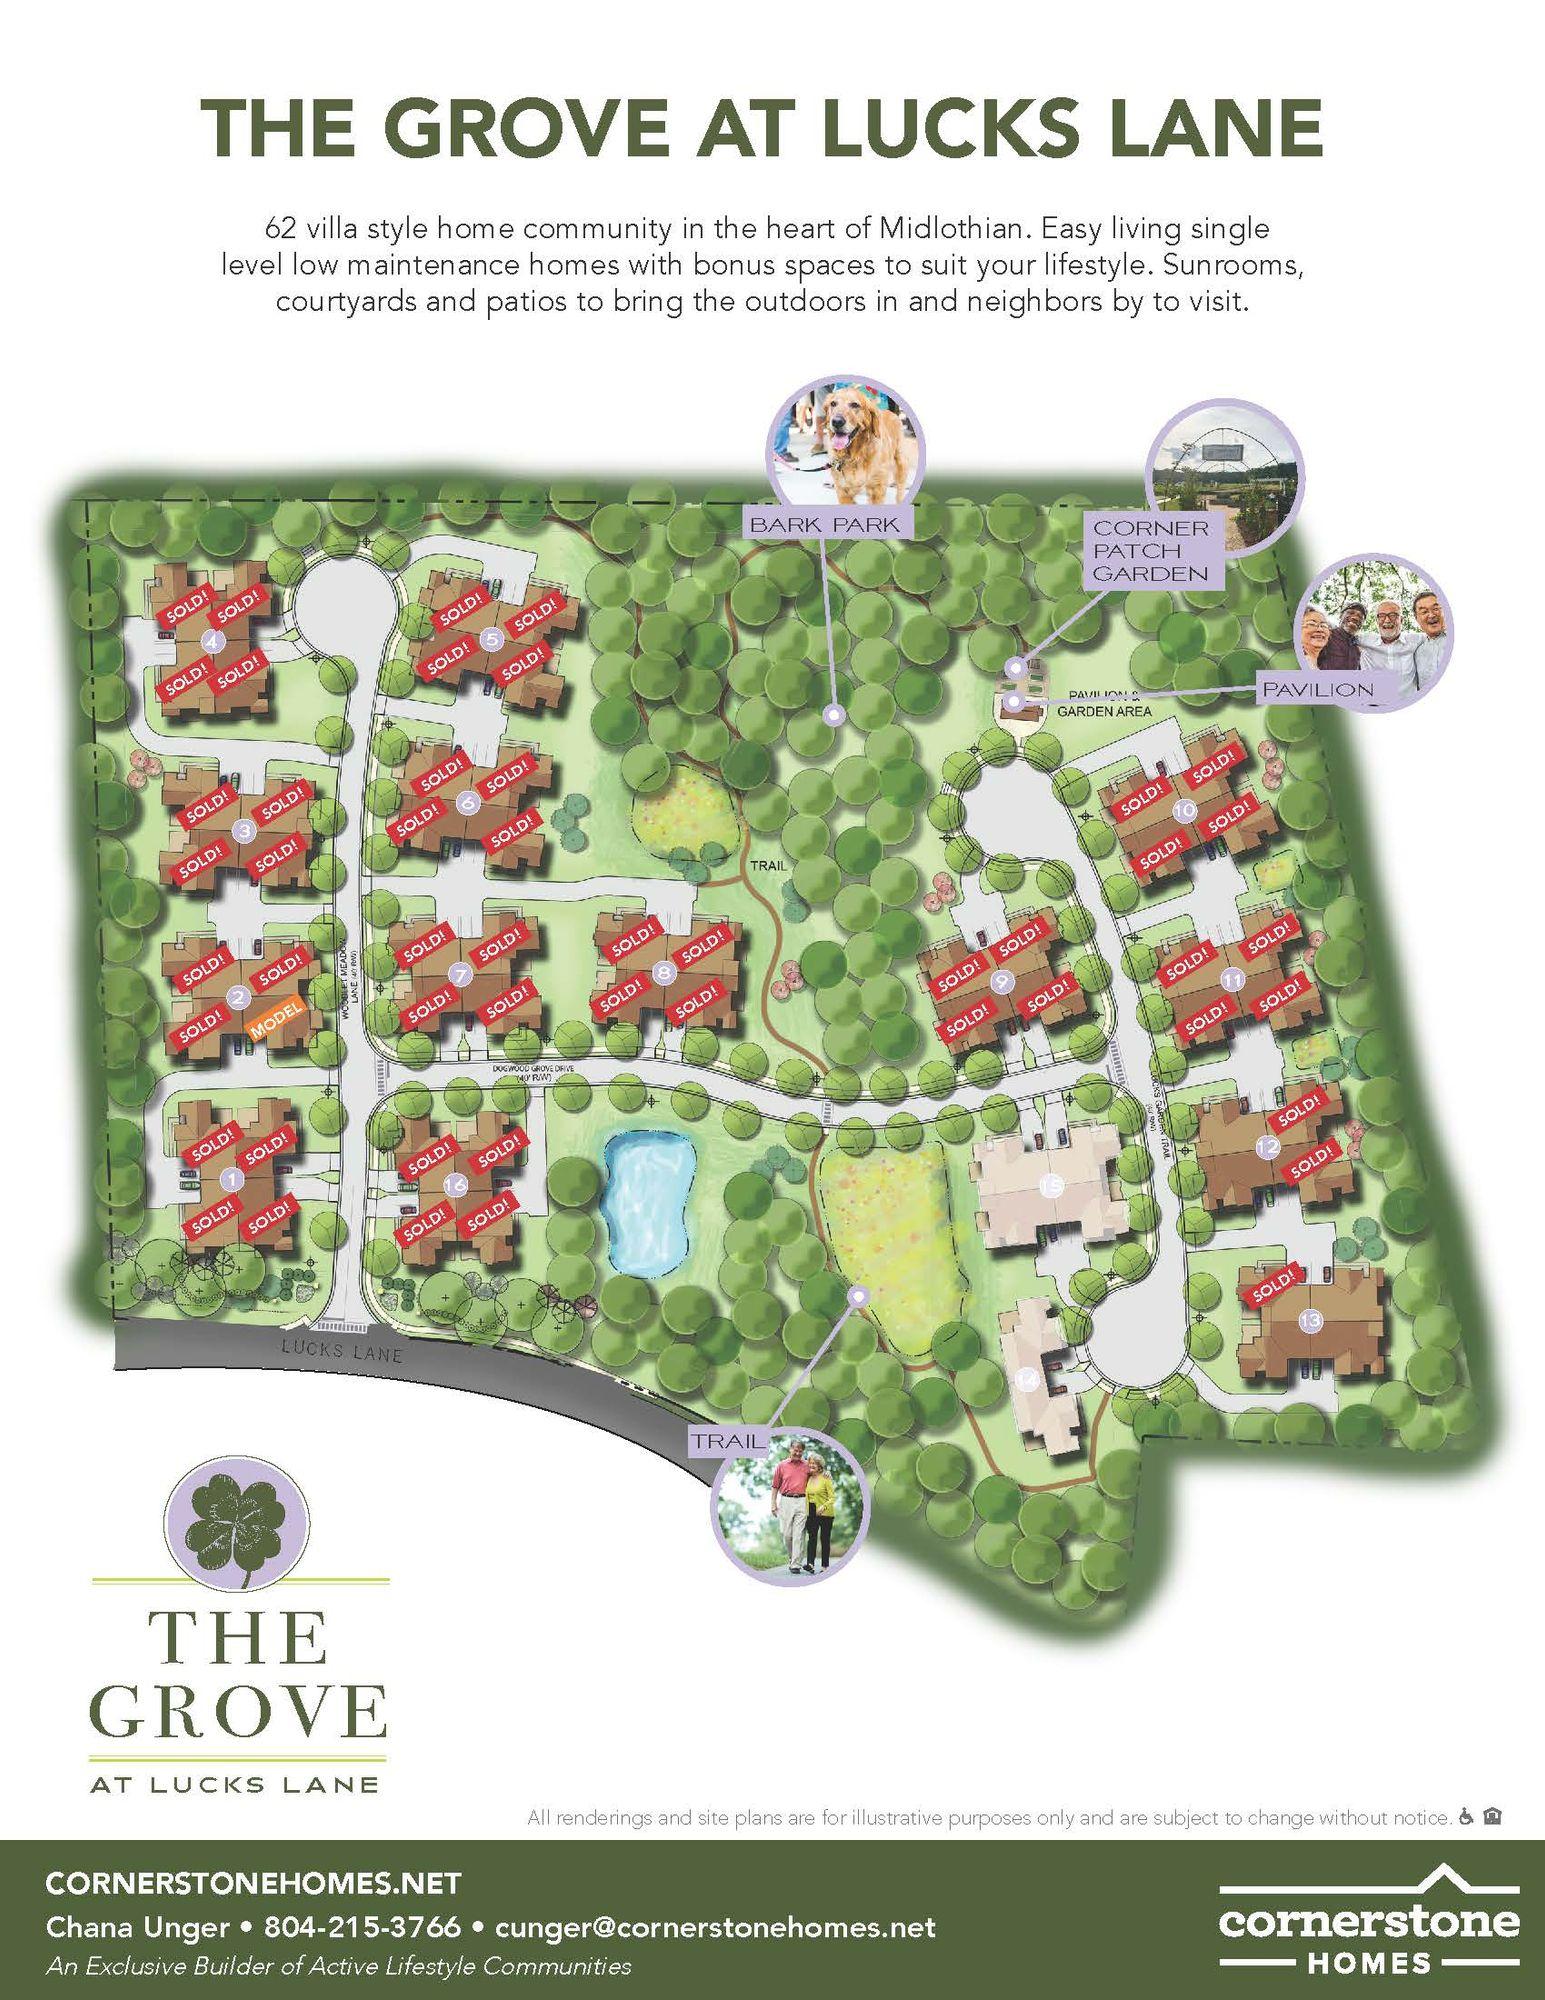 The Grove at Lucks Lane